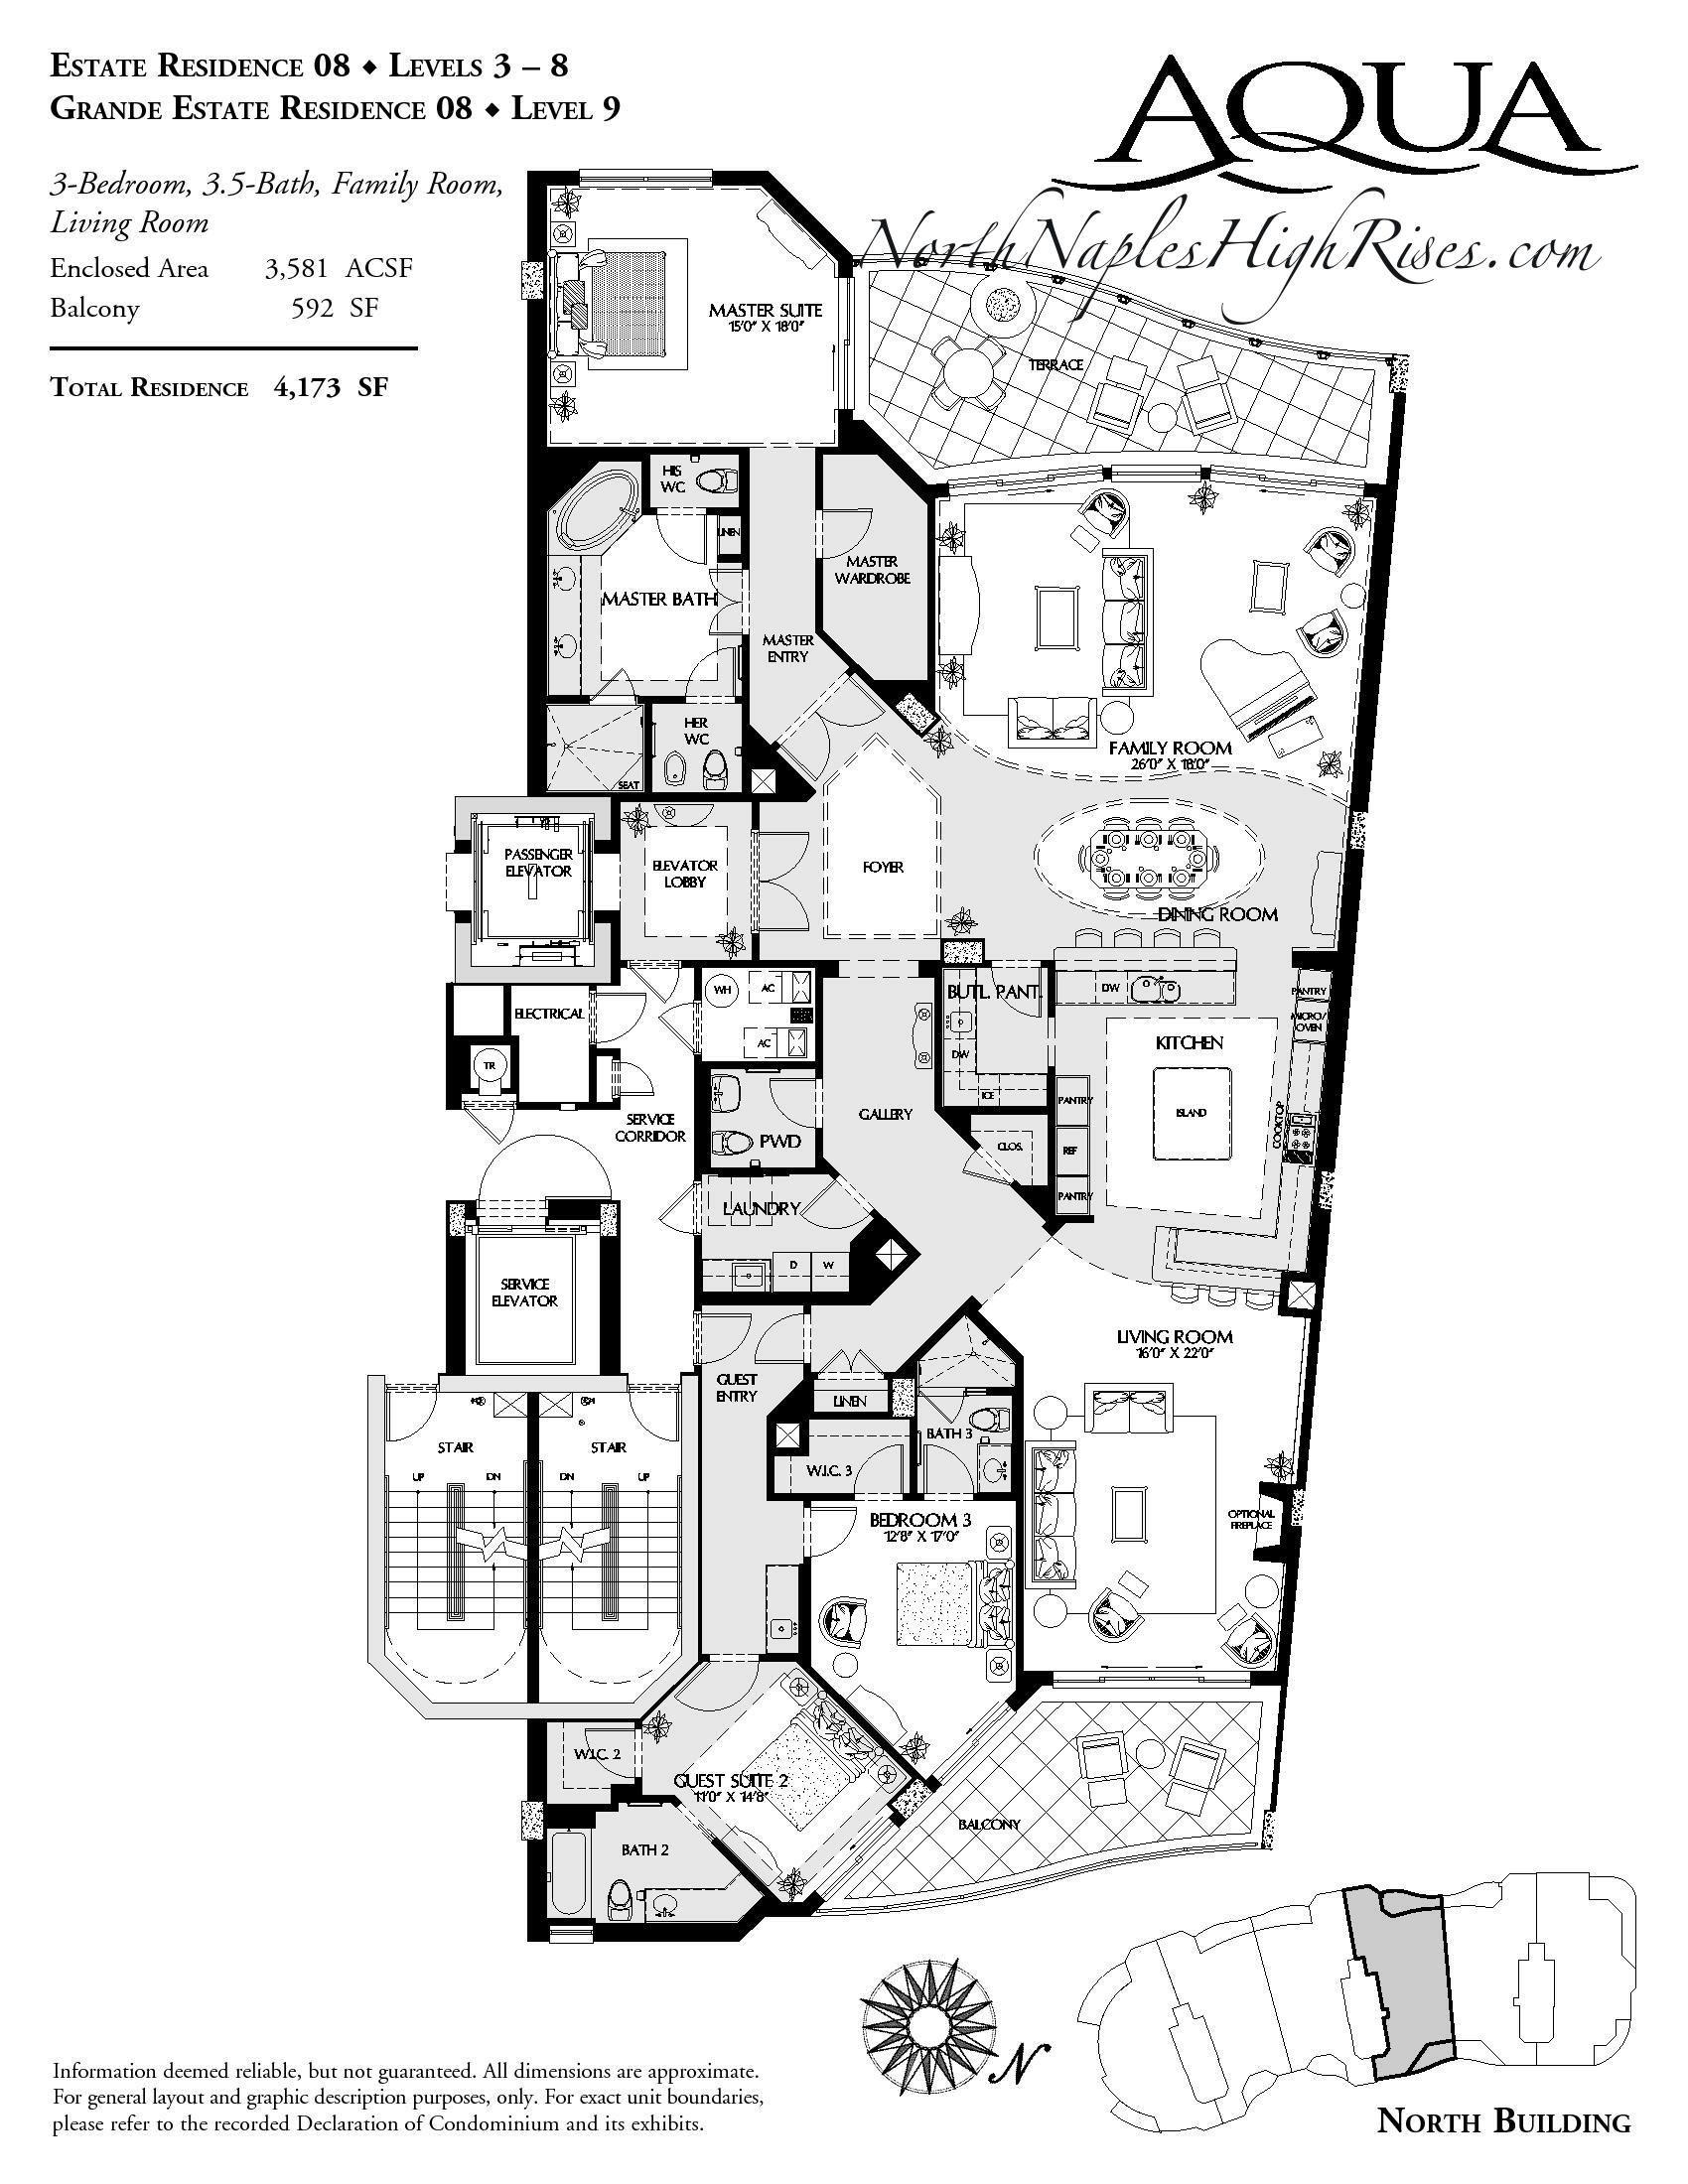 Aqua Naples At Pelican Isle Floor Plans Google Search Condo Floor Plans House Layout Plans Apartment Floor Plans